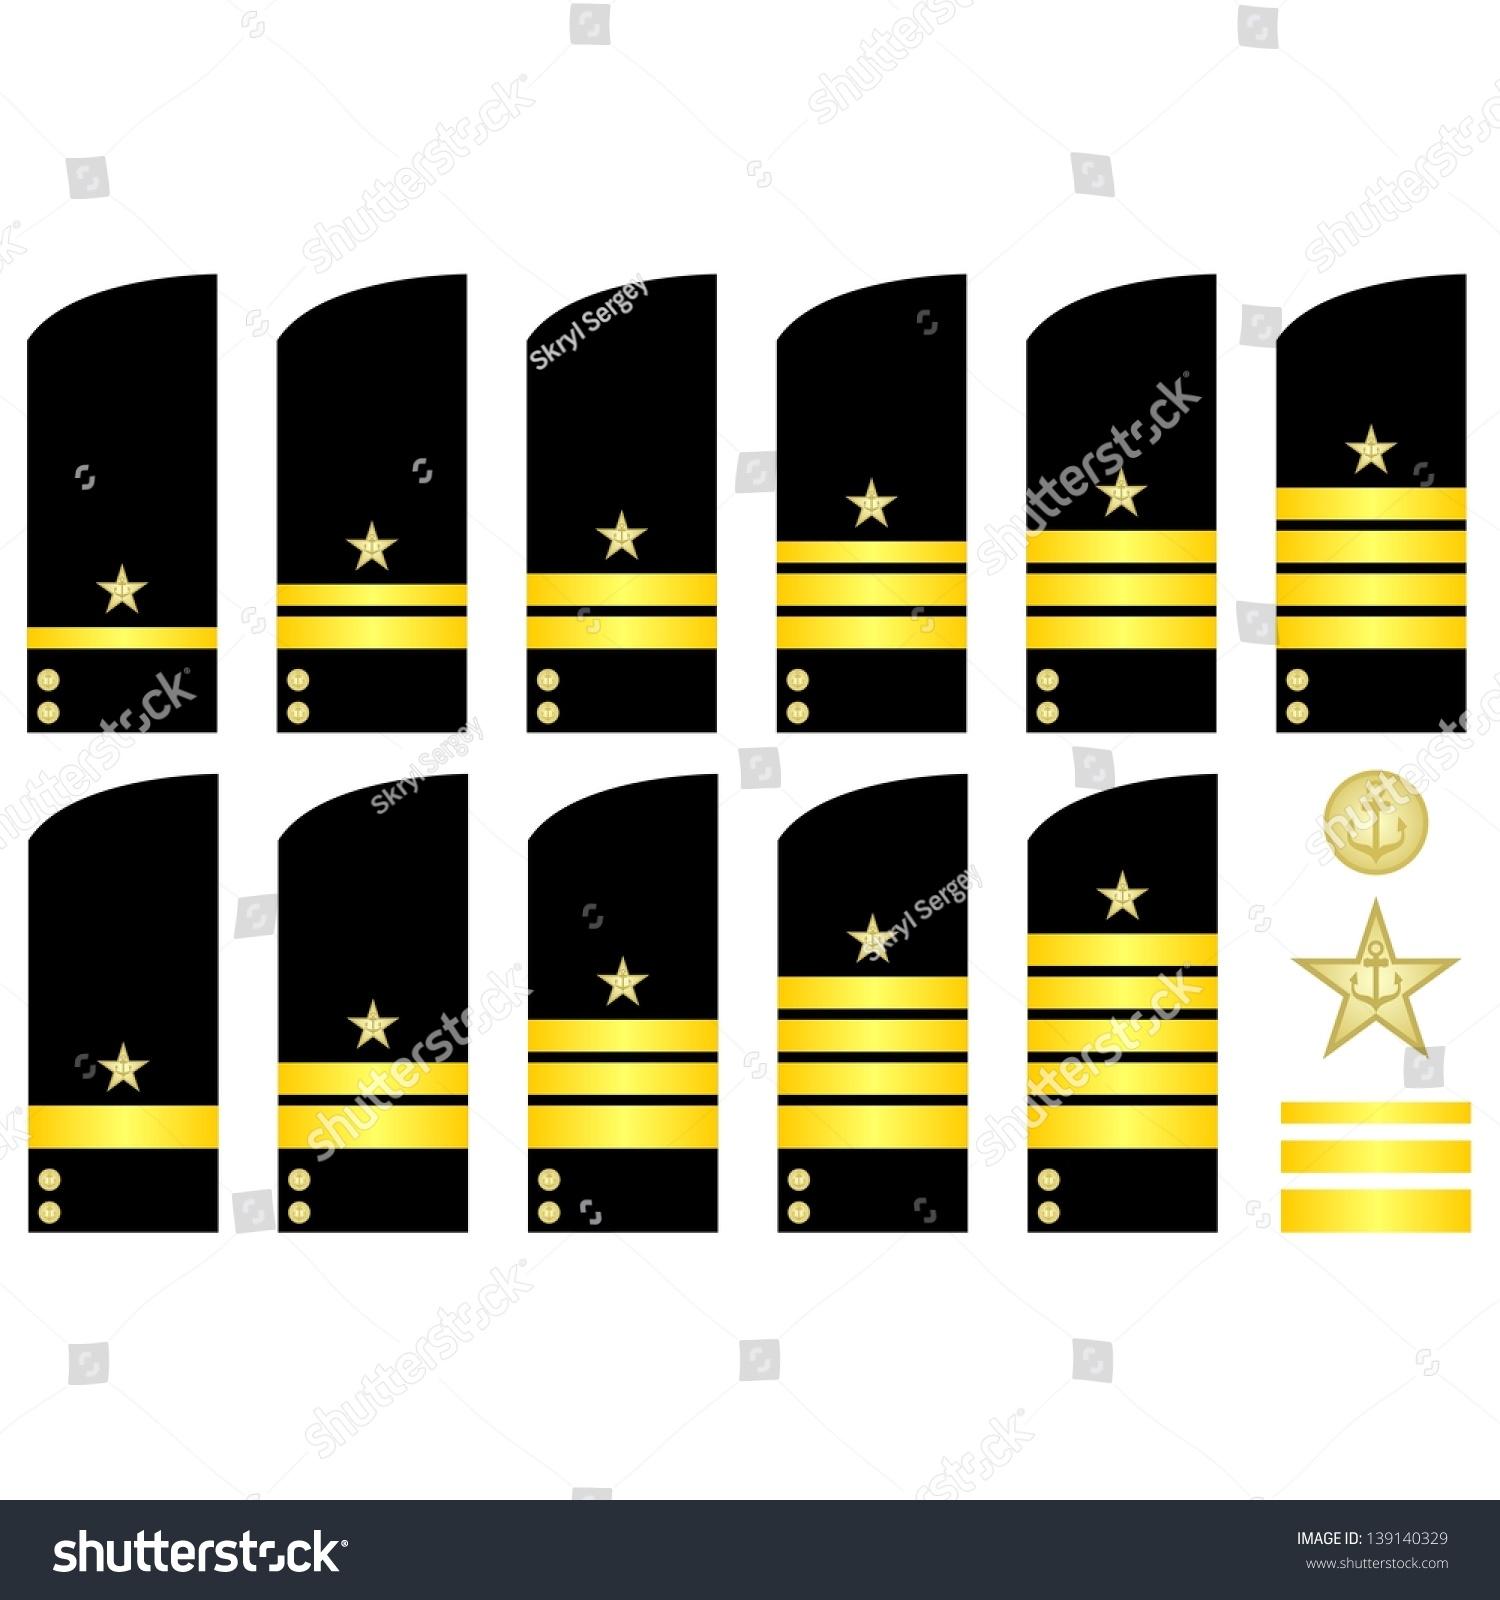 Military ranks insignia world illustration on stock vector 139140329 military ranks and insignia of the world the illustration on a white background biocorpaavc Images